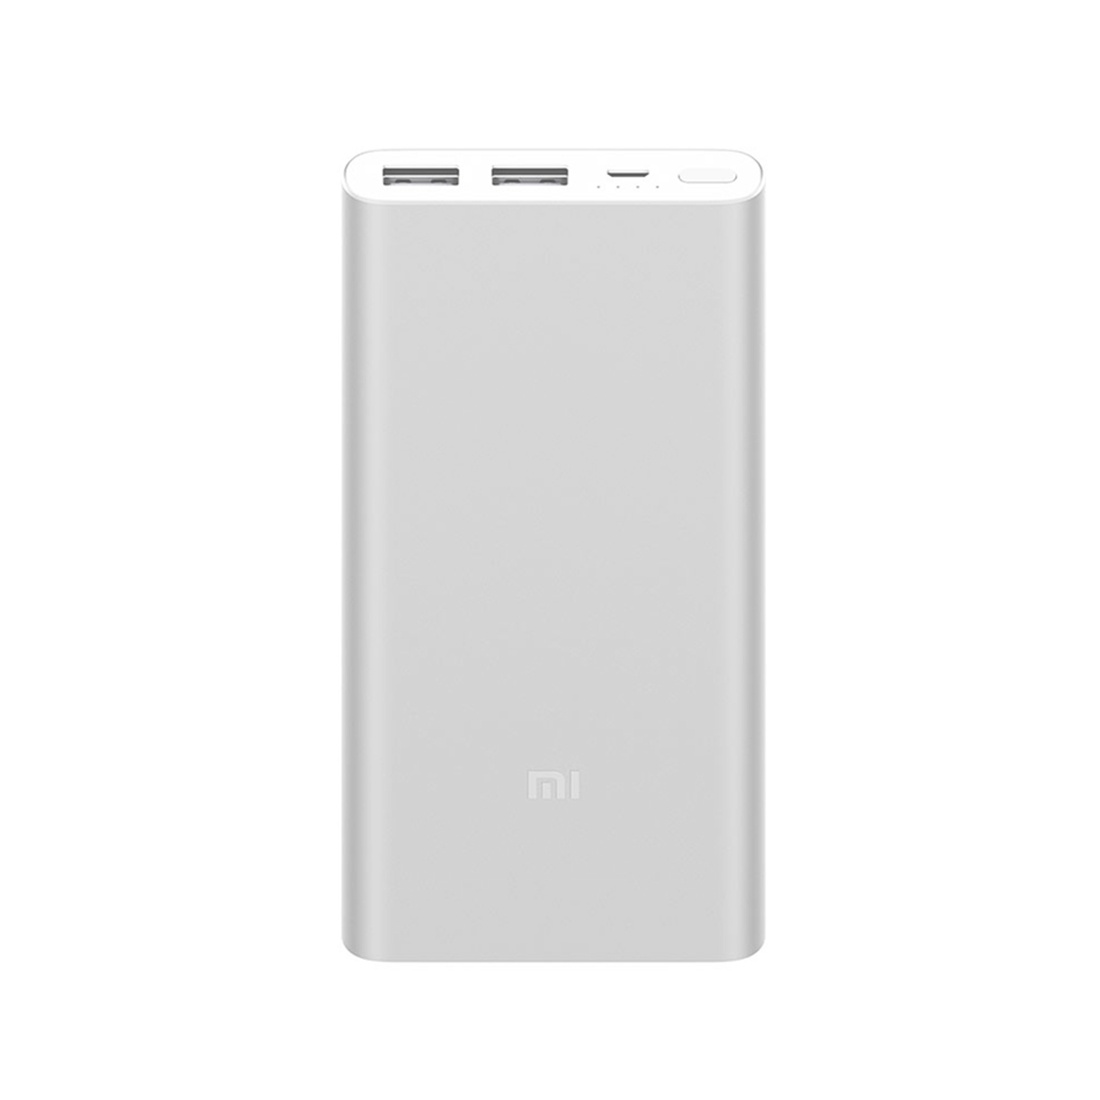 Зарядное устройство Xiaomi Power Bank 10000 мАч, серебристый портативное зарядное устройство xiaomi mi power bank 2s slim 10000mah серебристый